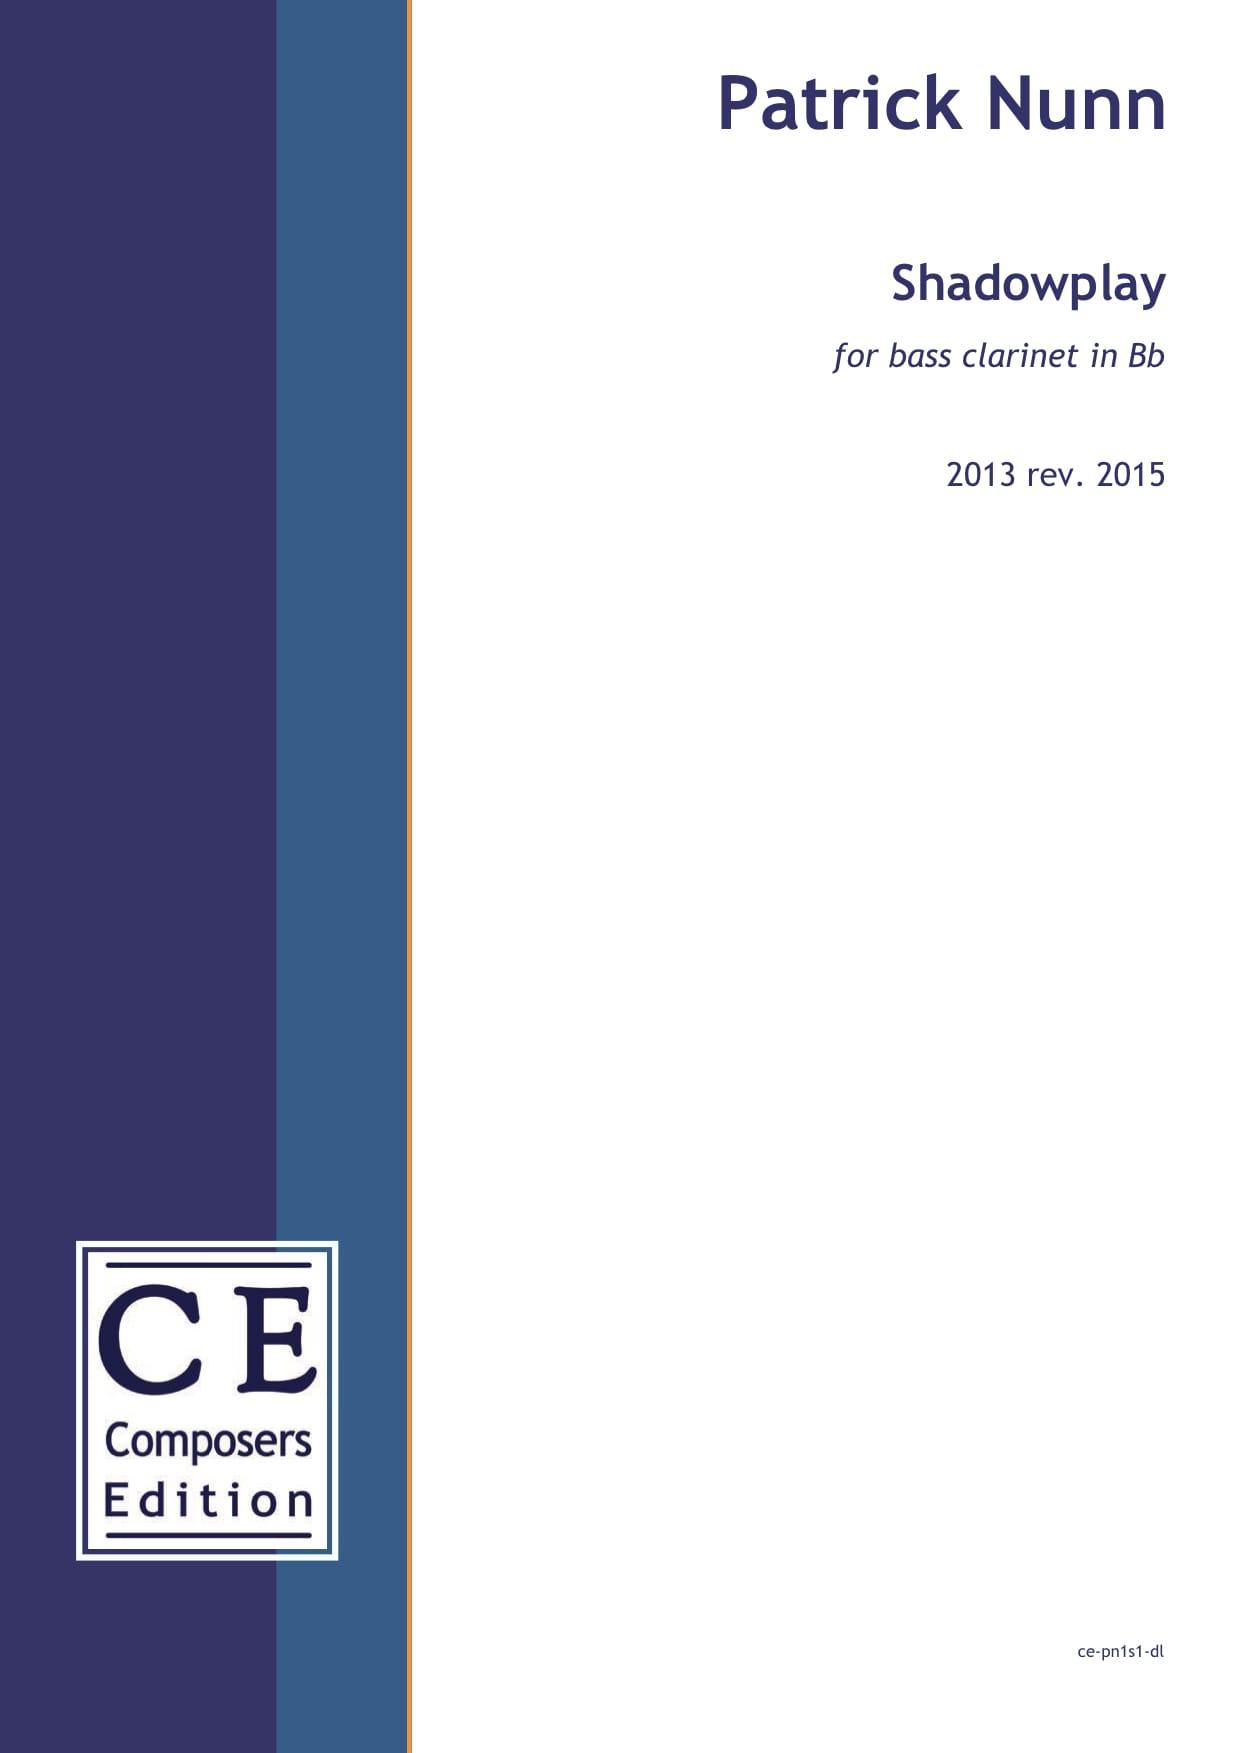 Patrick Nunn: Shadowplay for bass clarinet in Bb